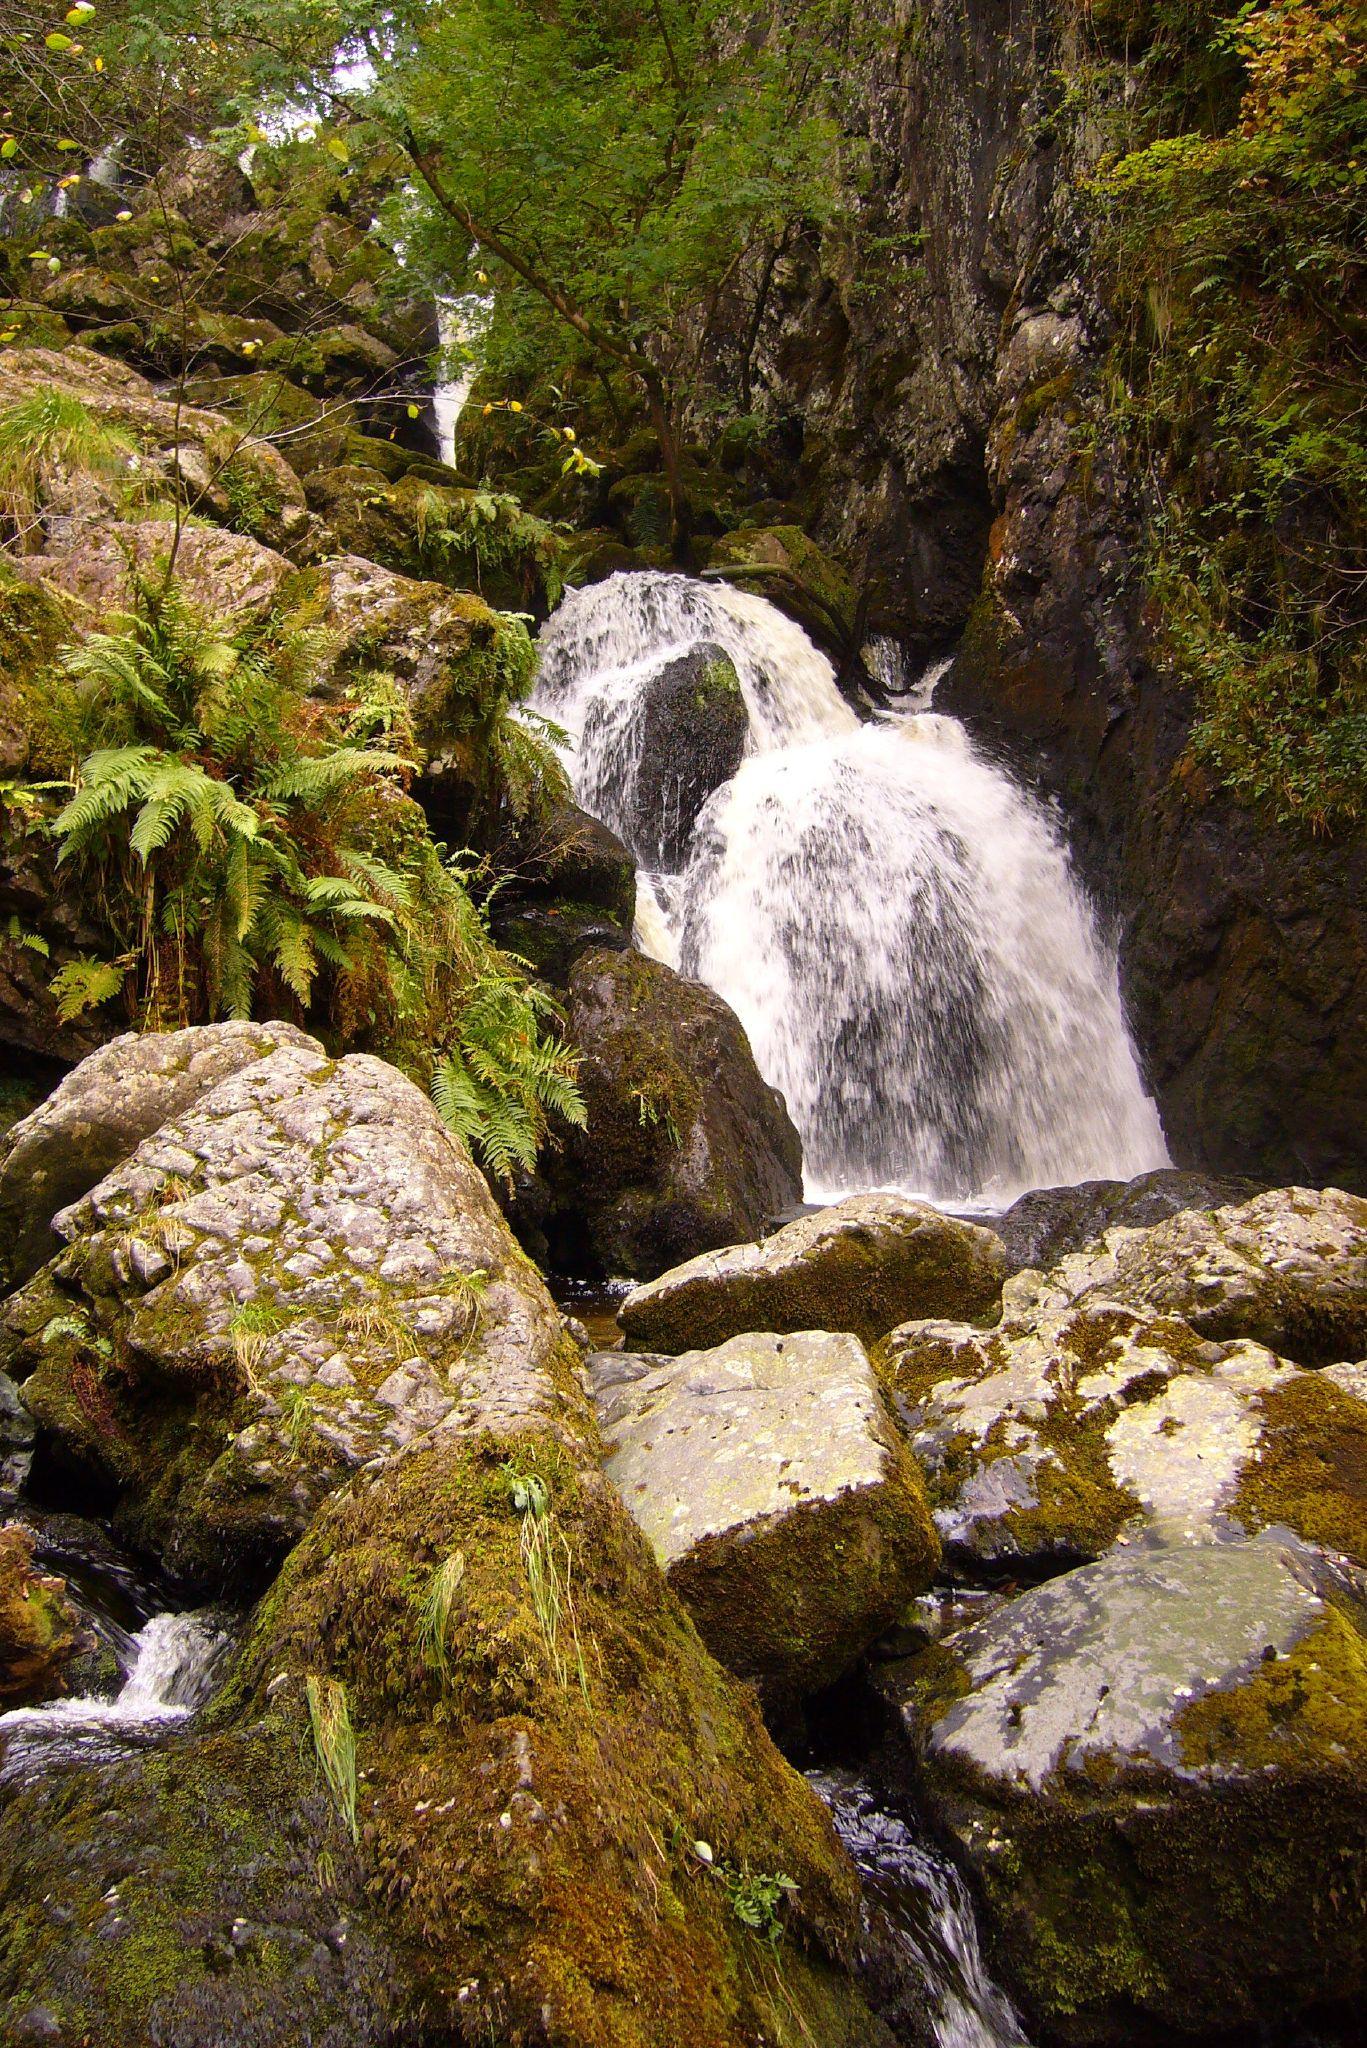 Rough And Tumble >> Lodore Falls - Wikipedia